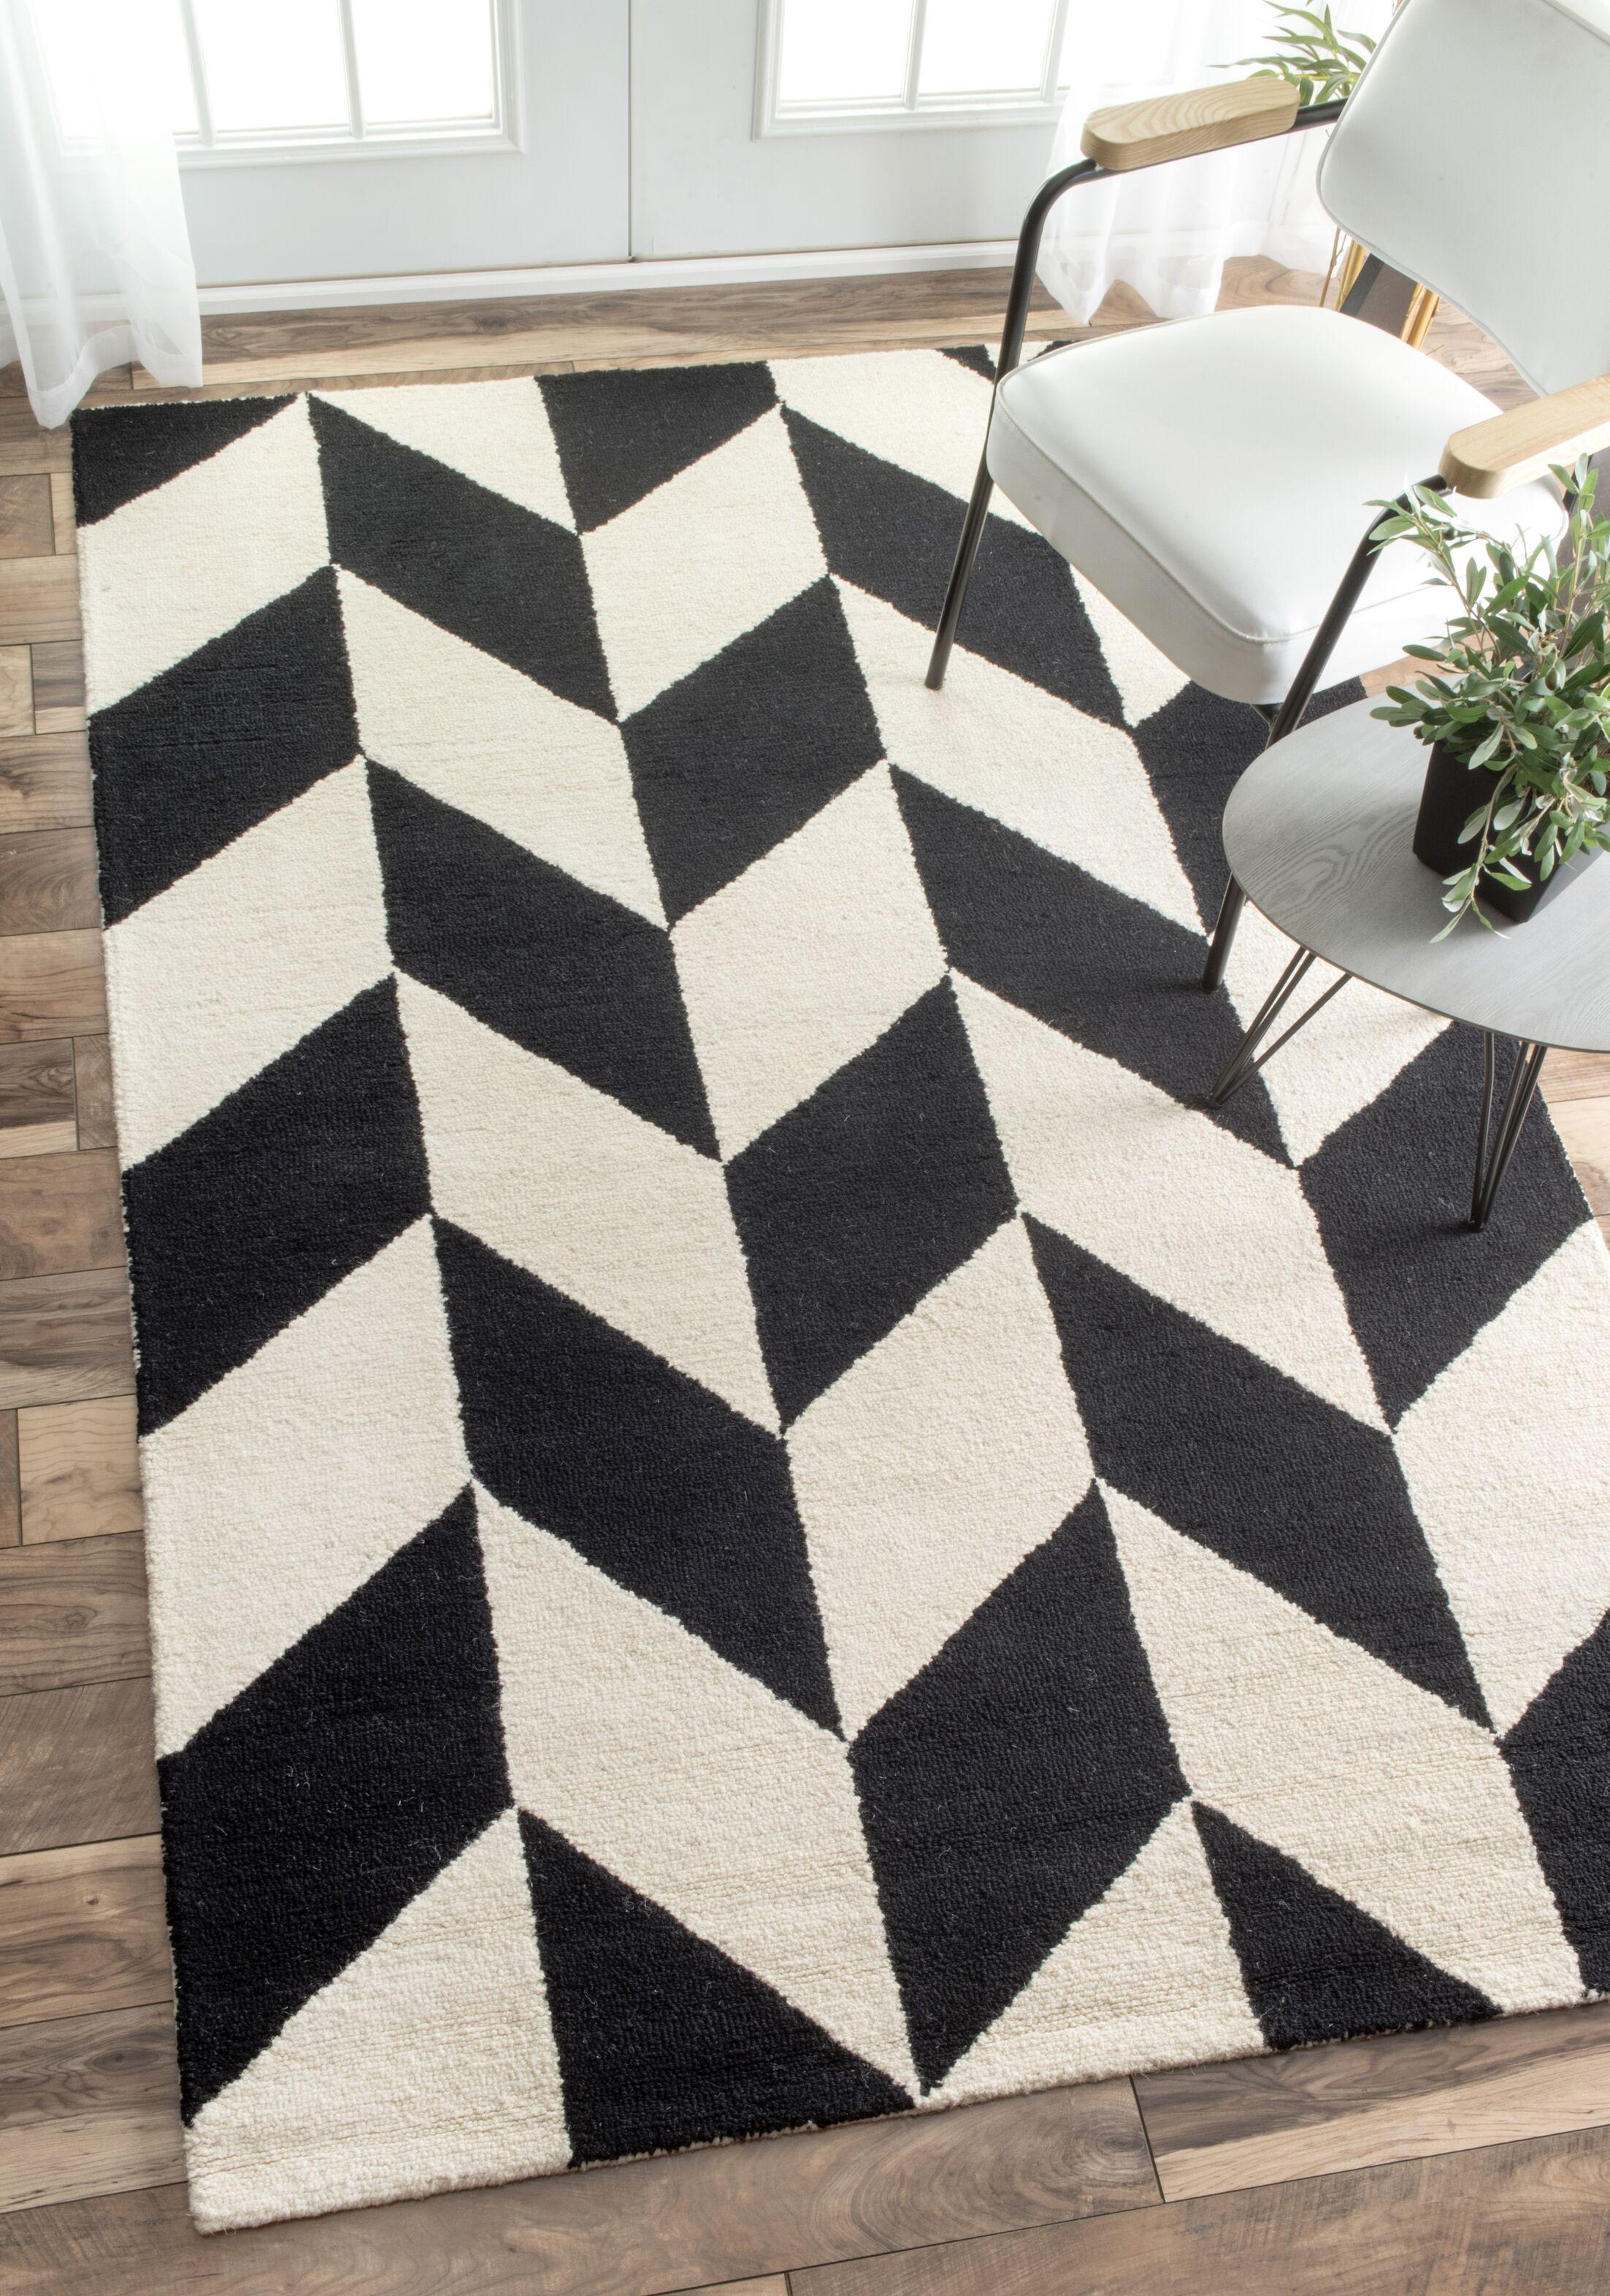 Rummel Hand-Tufted Black/White Indoor Area Rug Rug Size: Rectangle 8' 6